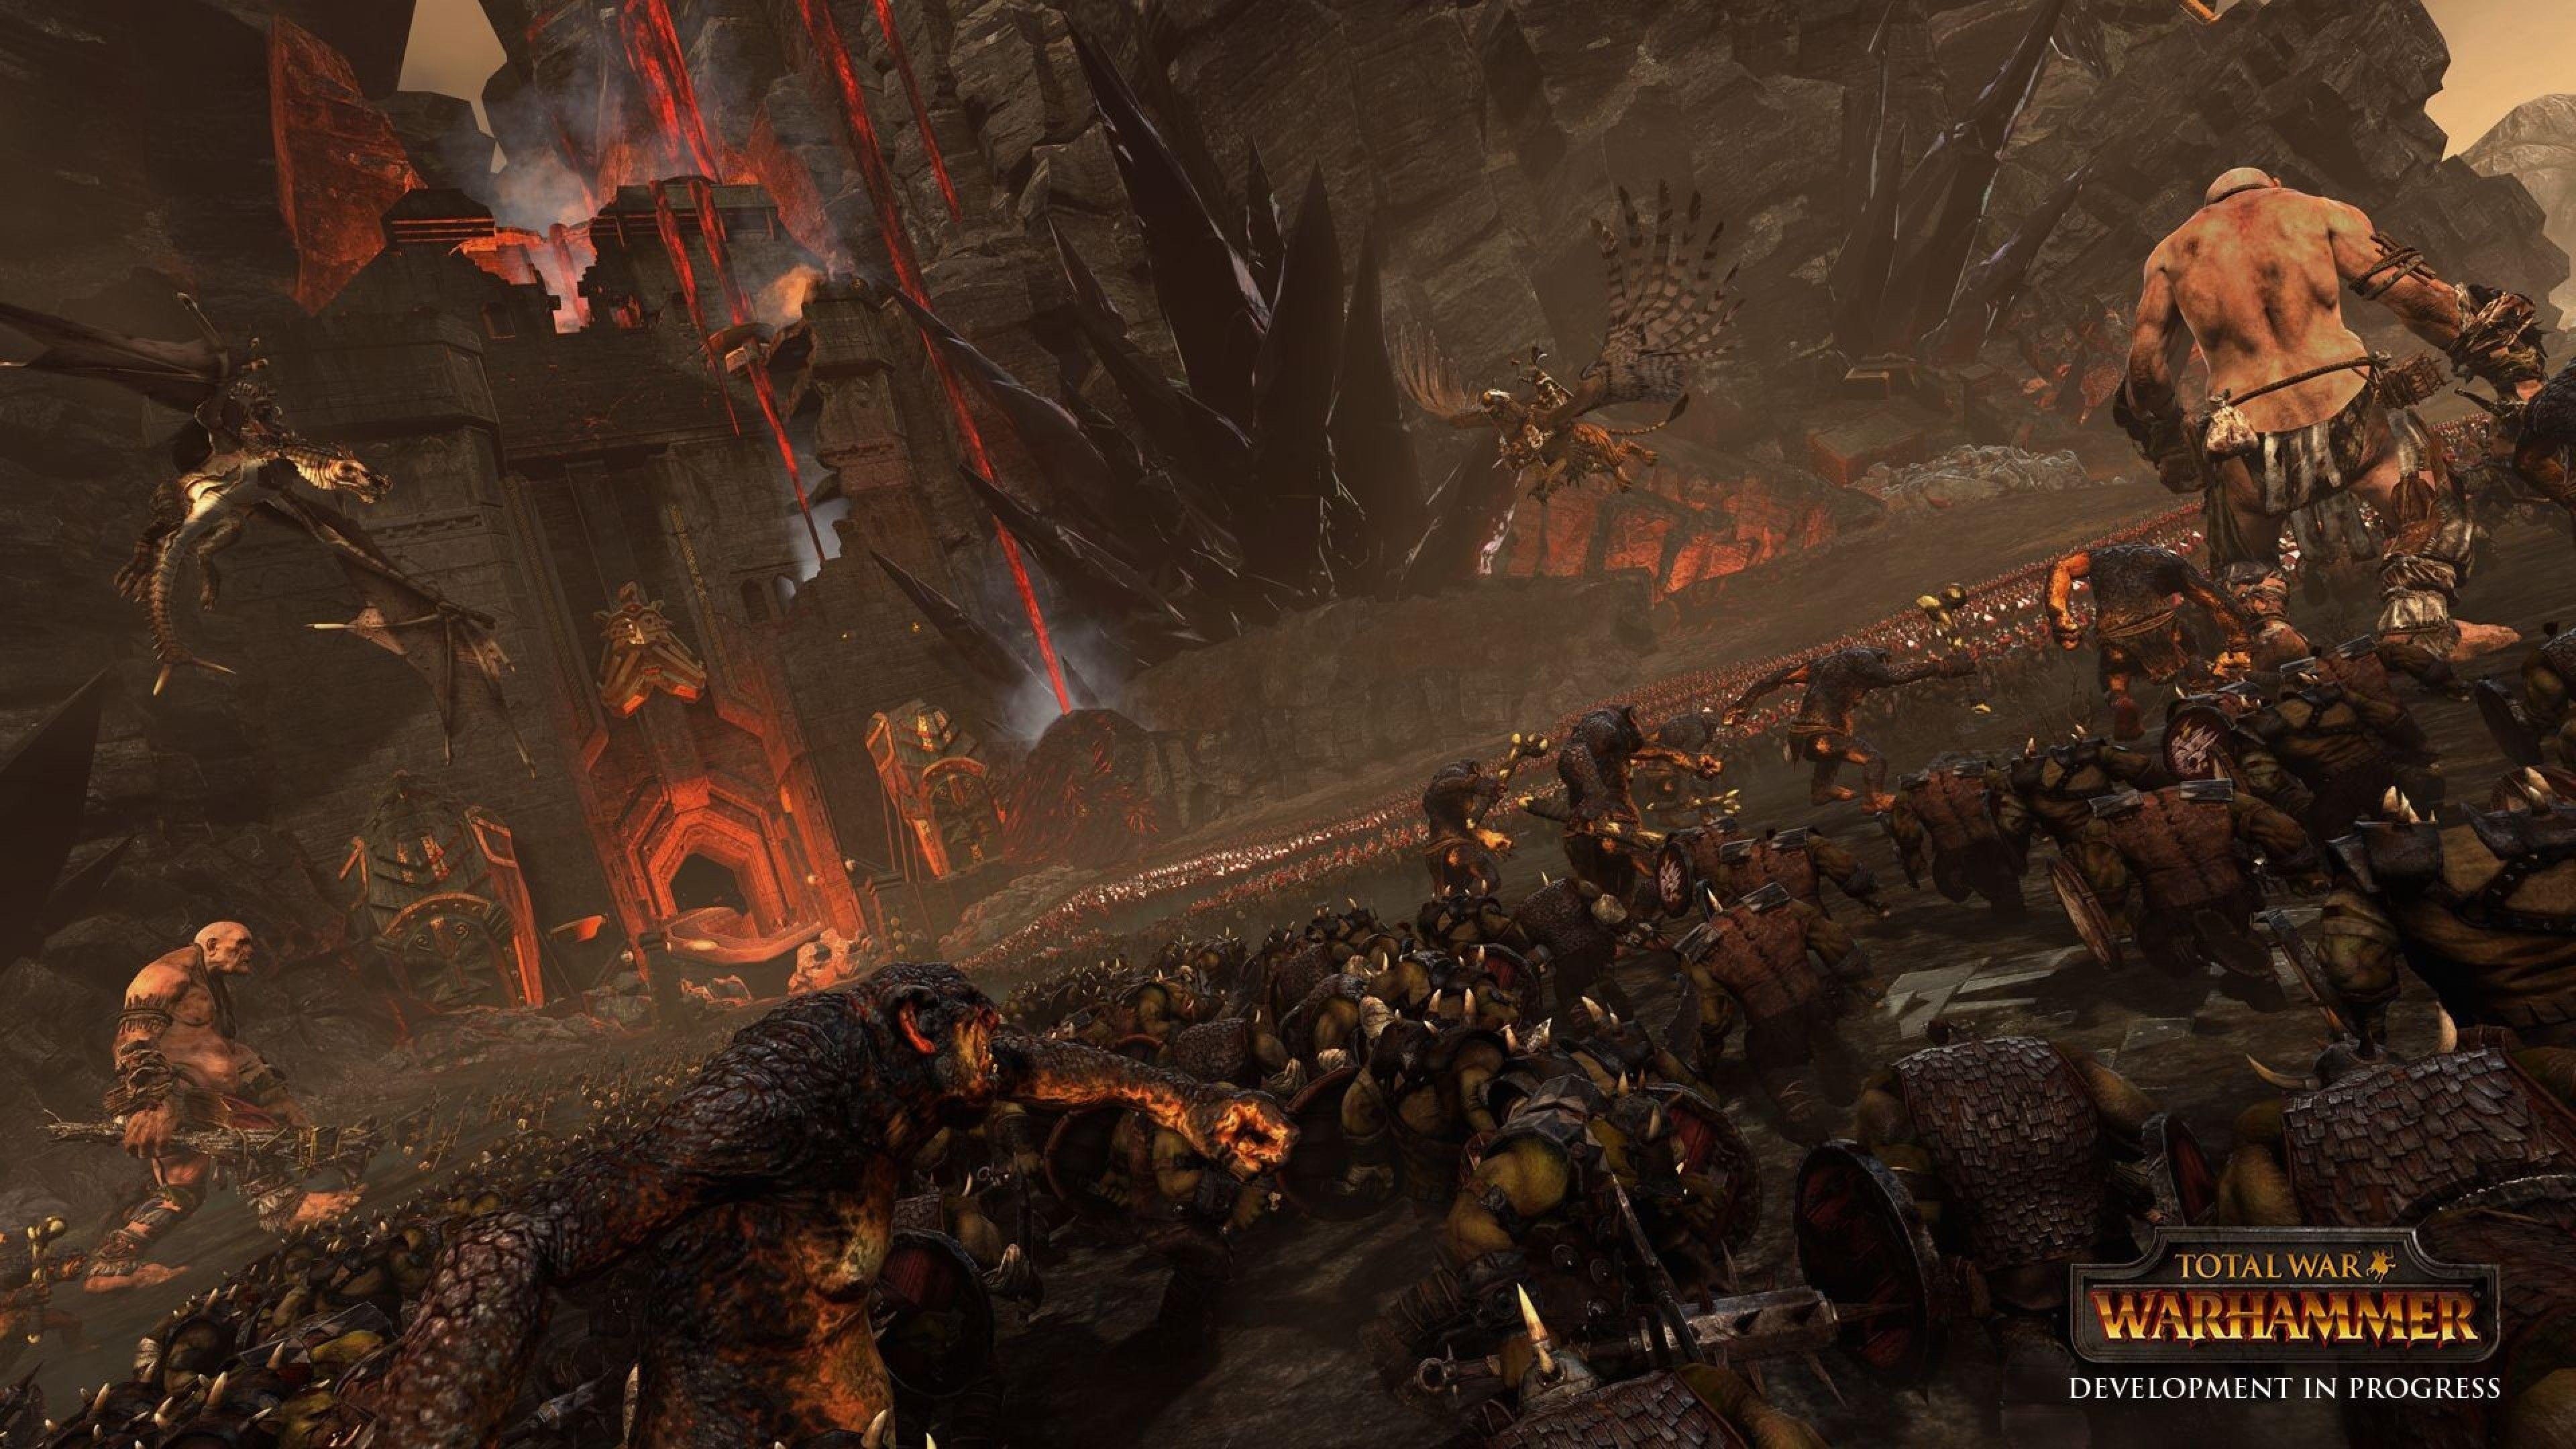 Warhammer Fantasy Wallpapers Top Free Warhammer Fantasy Backgrounds Wallpaperaccess